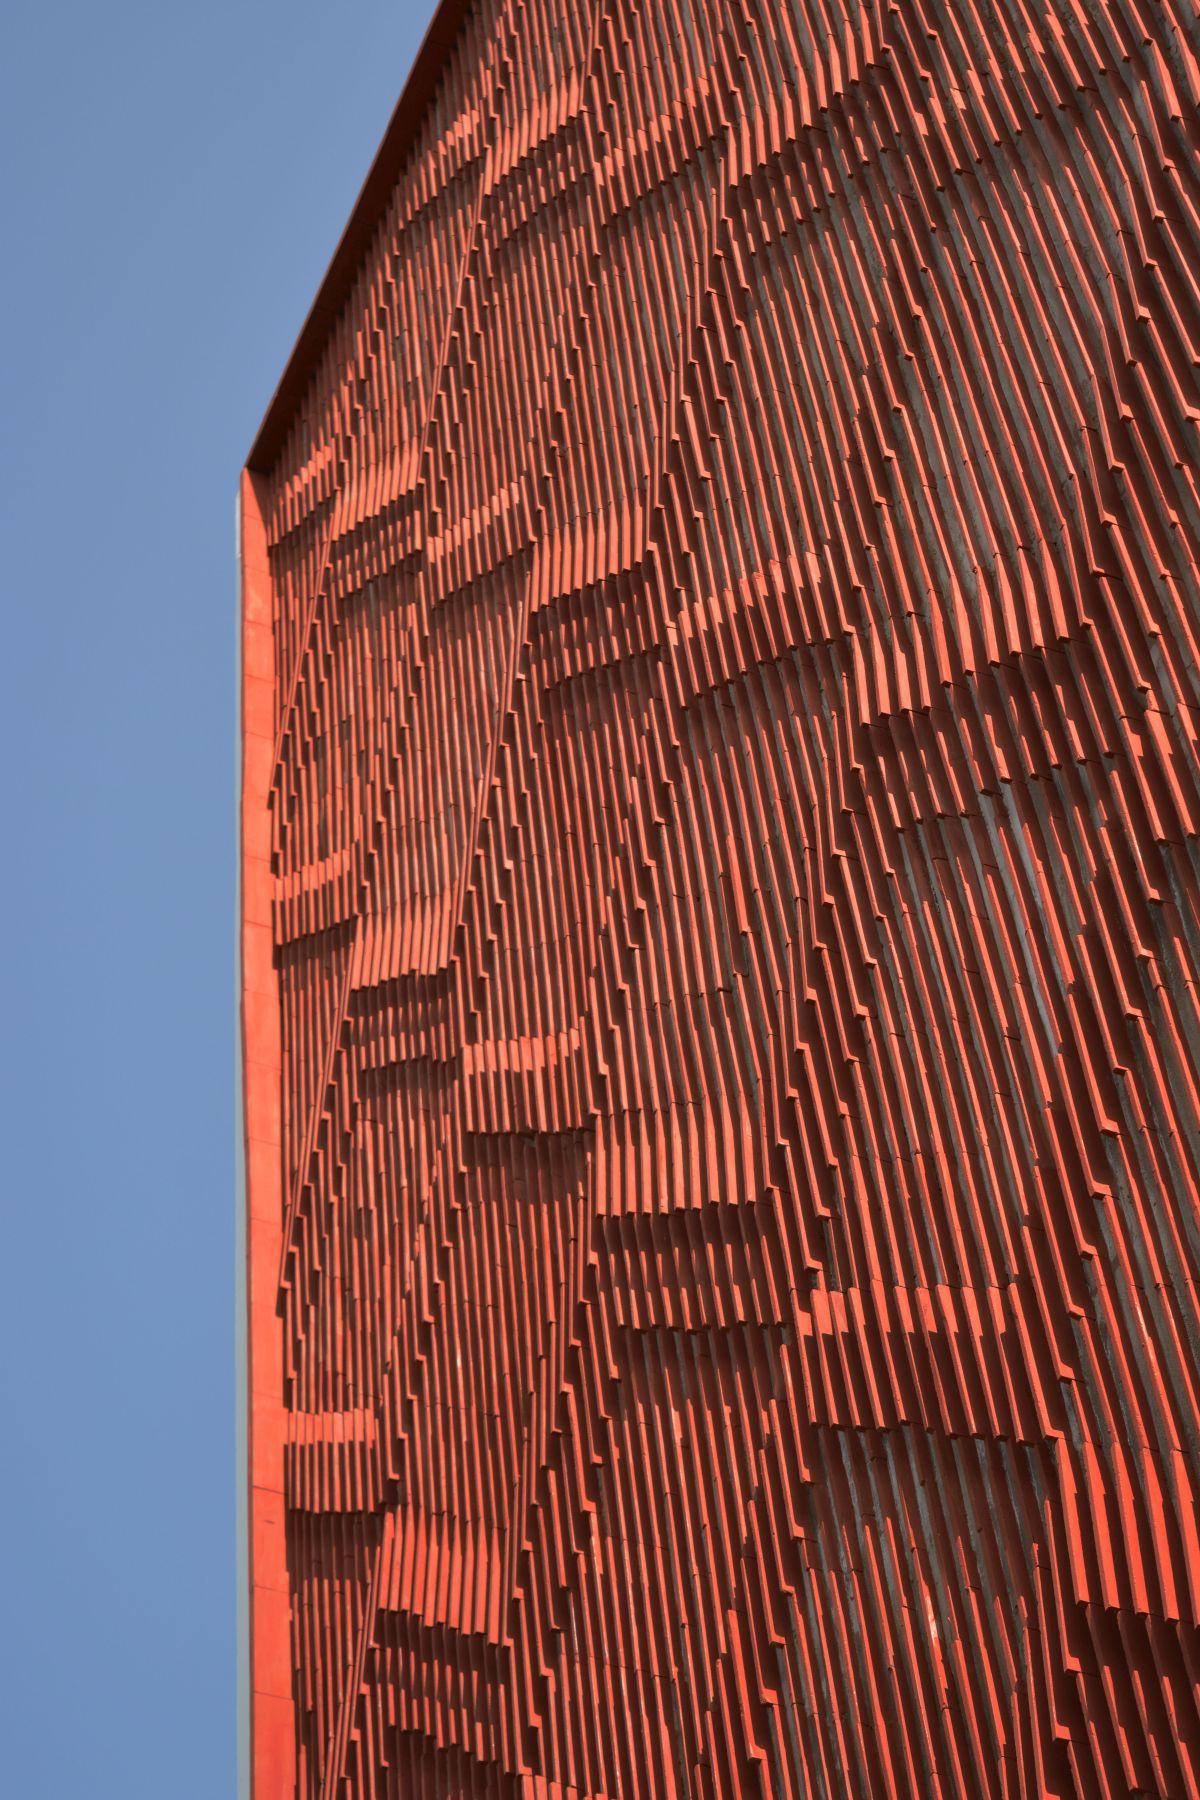 Clay roof tiles façade to minimize heat gain and has decorative function, at Vadodara, by Manoj Patel Design Studio 72